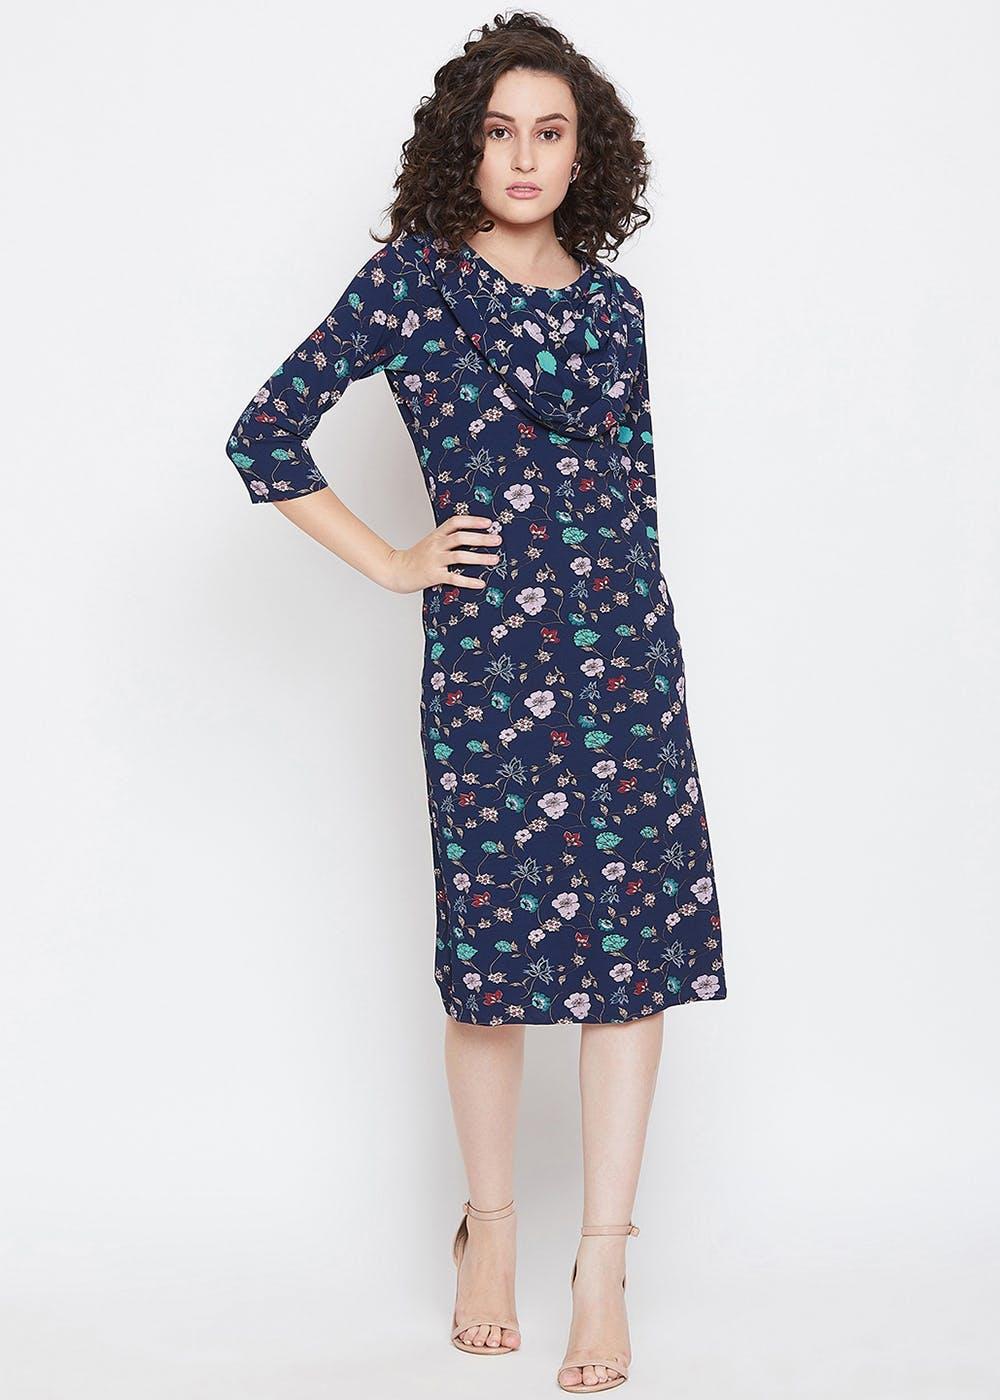 Cowl Neck Detail Floral Printed Blue Bodycon Dress